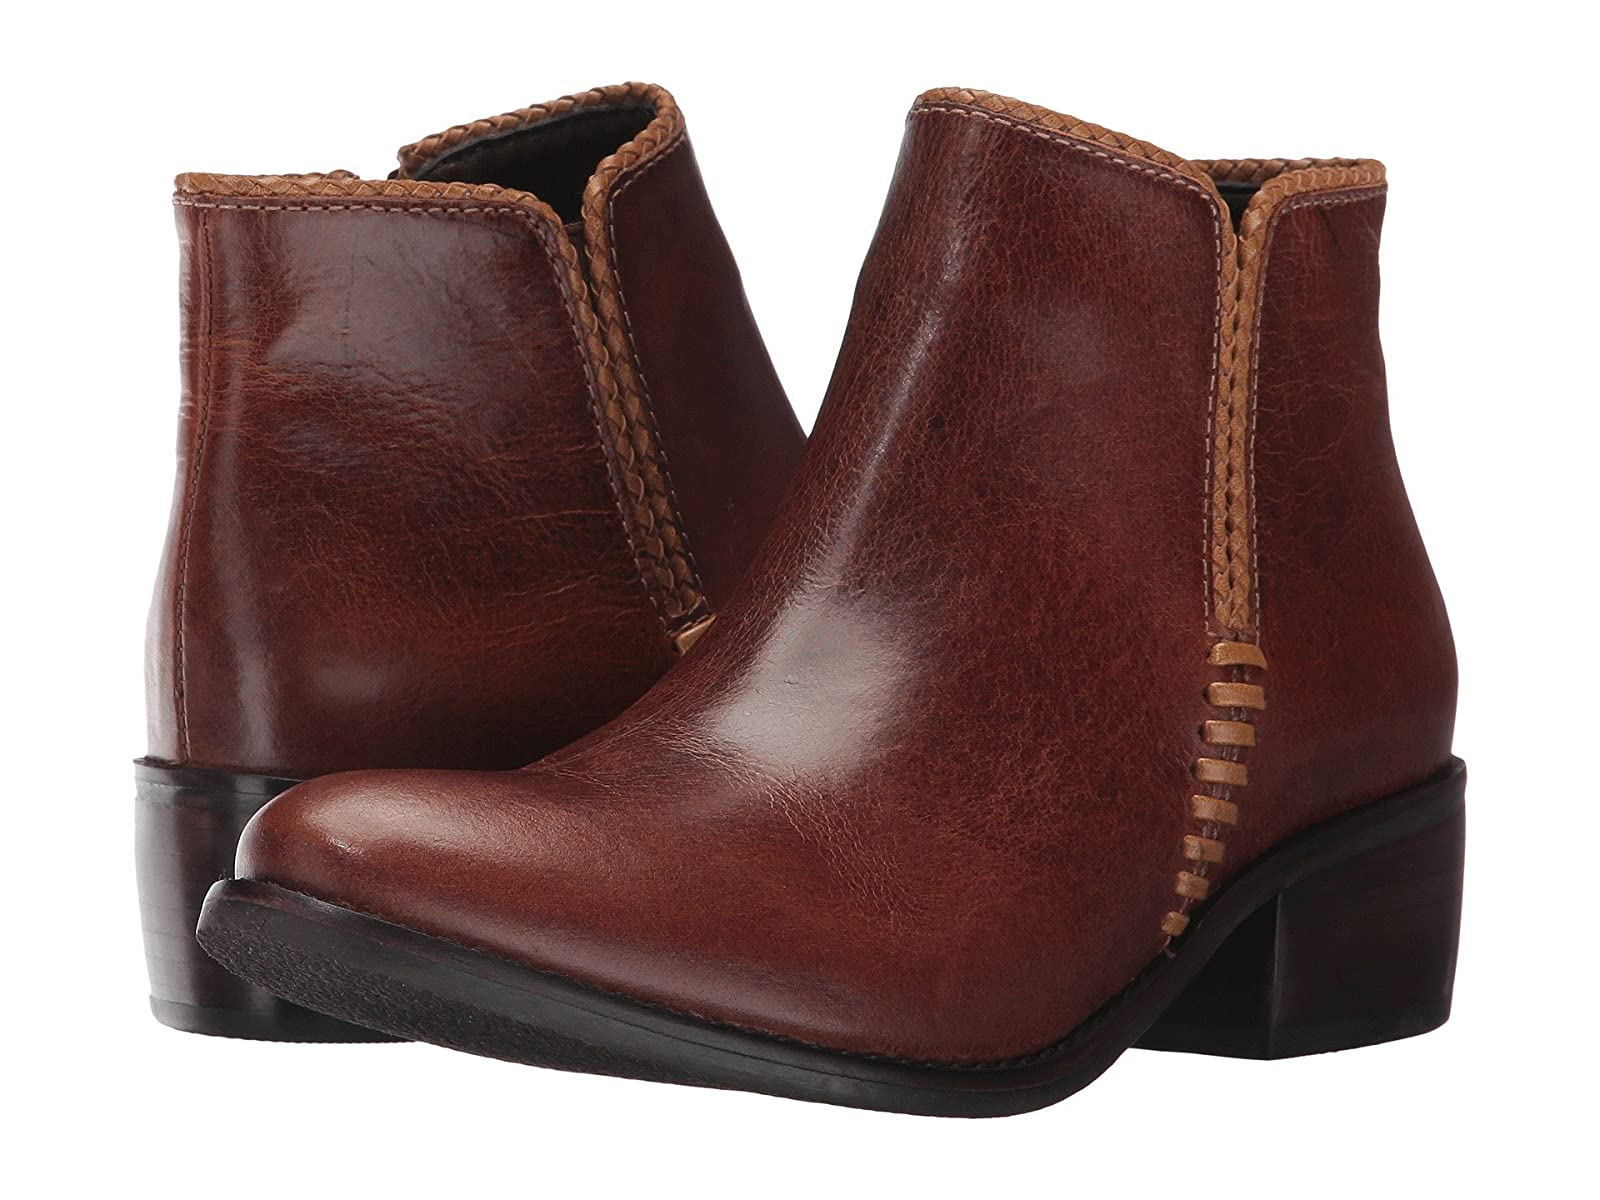 Matisse MergeCheap and distinctive eye-catching shoes